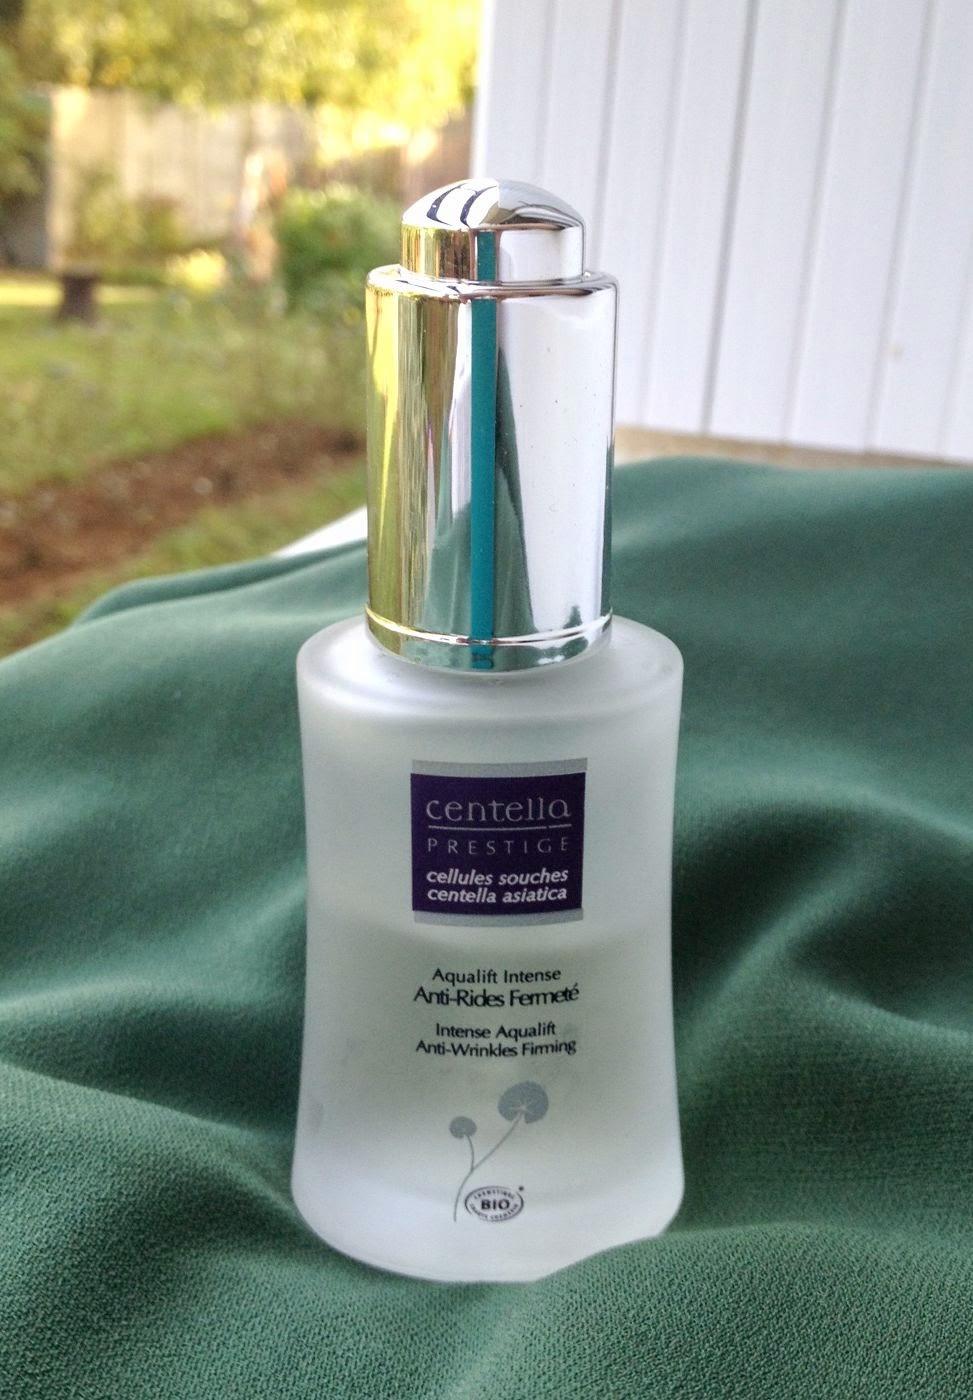 http://celine-happytime.blogspot.fr/2014/11/mon-serum-bio-par-centella-prestige.html